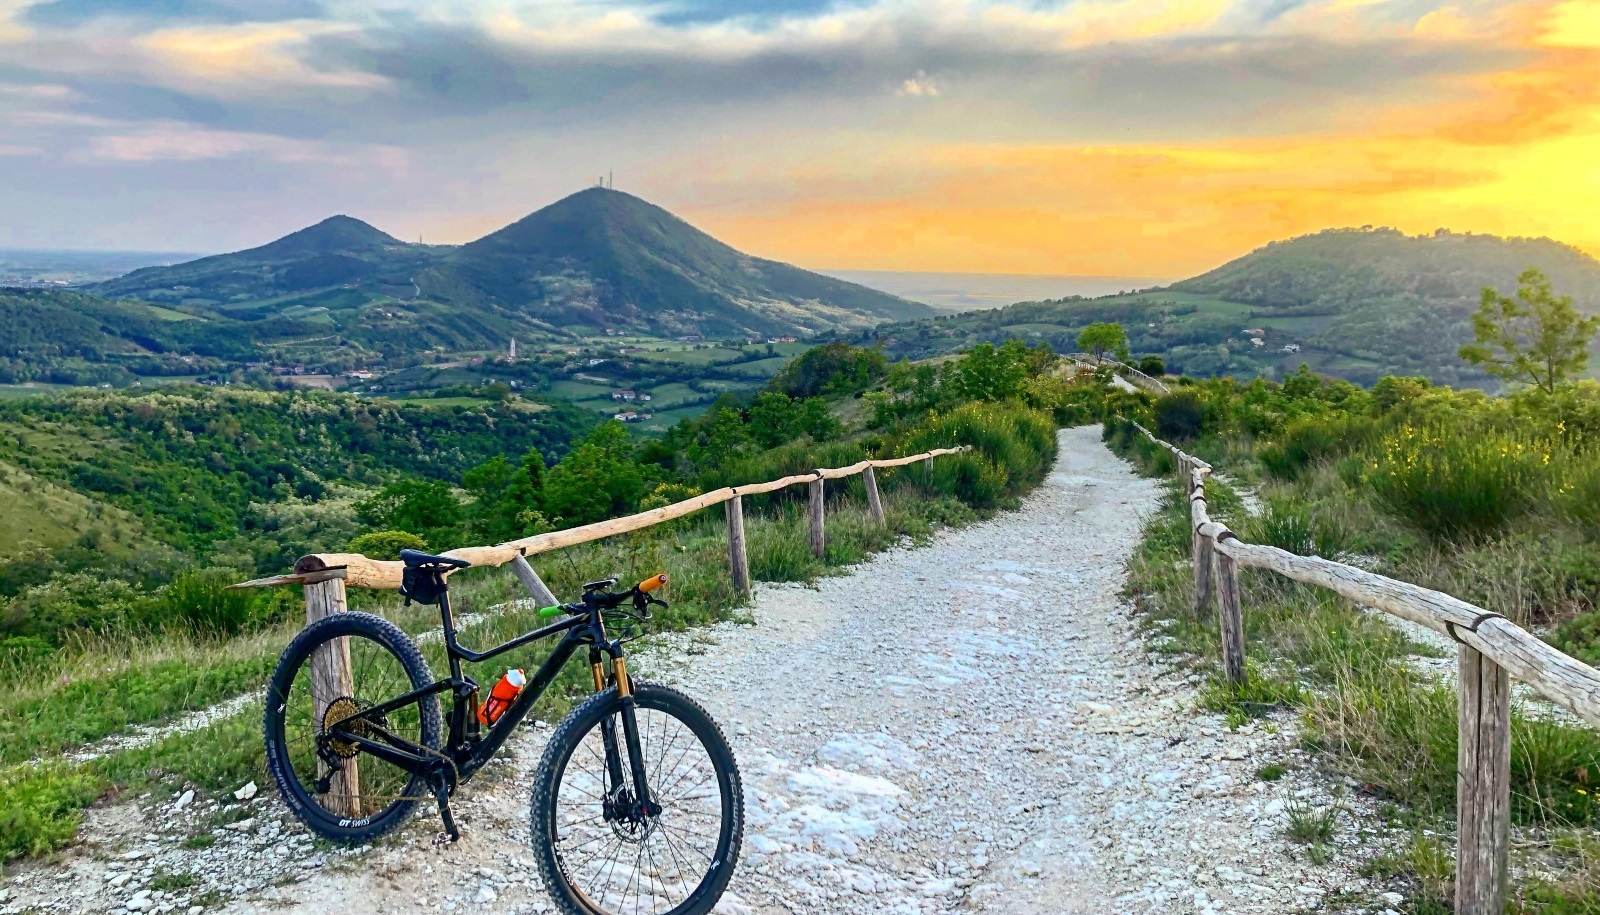 colli euganei tour in bici